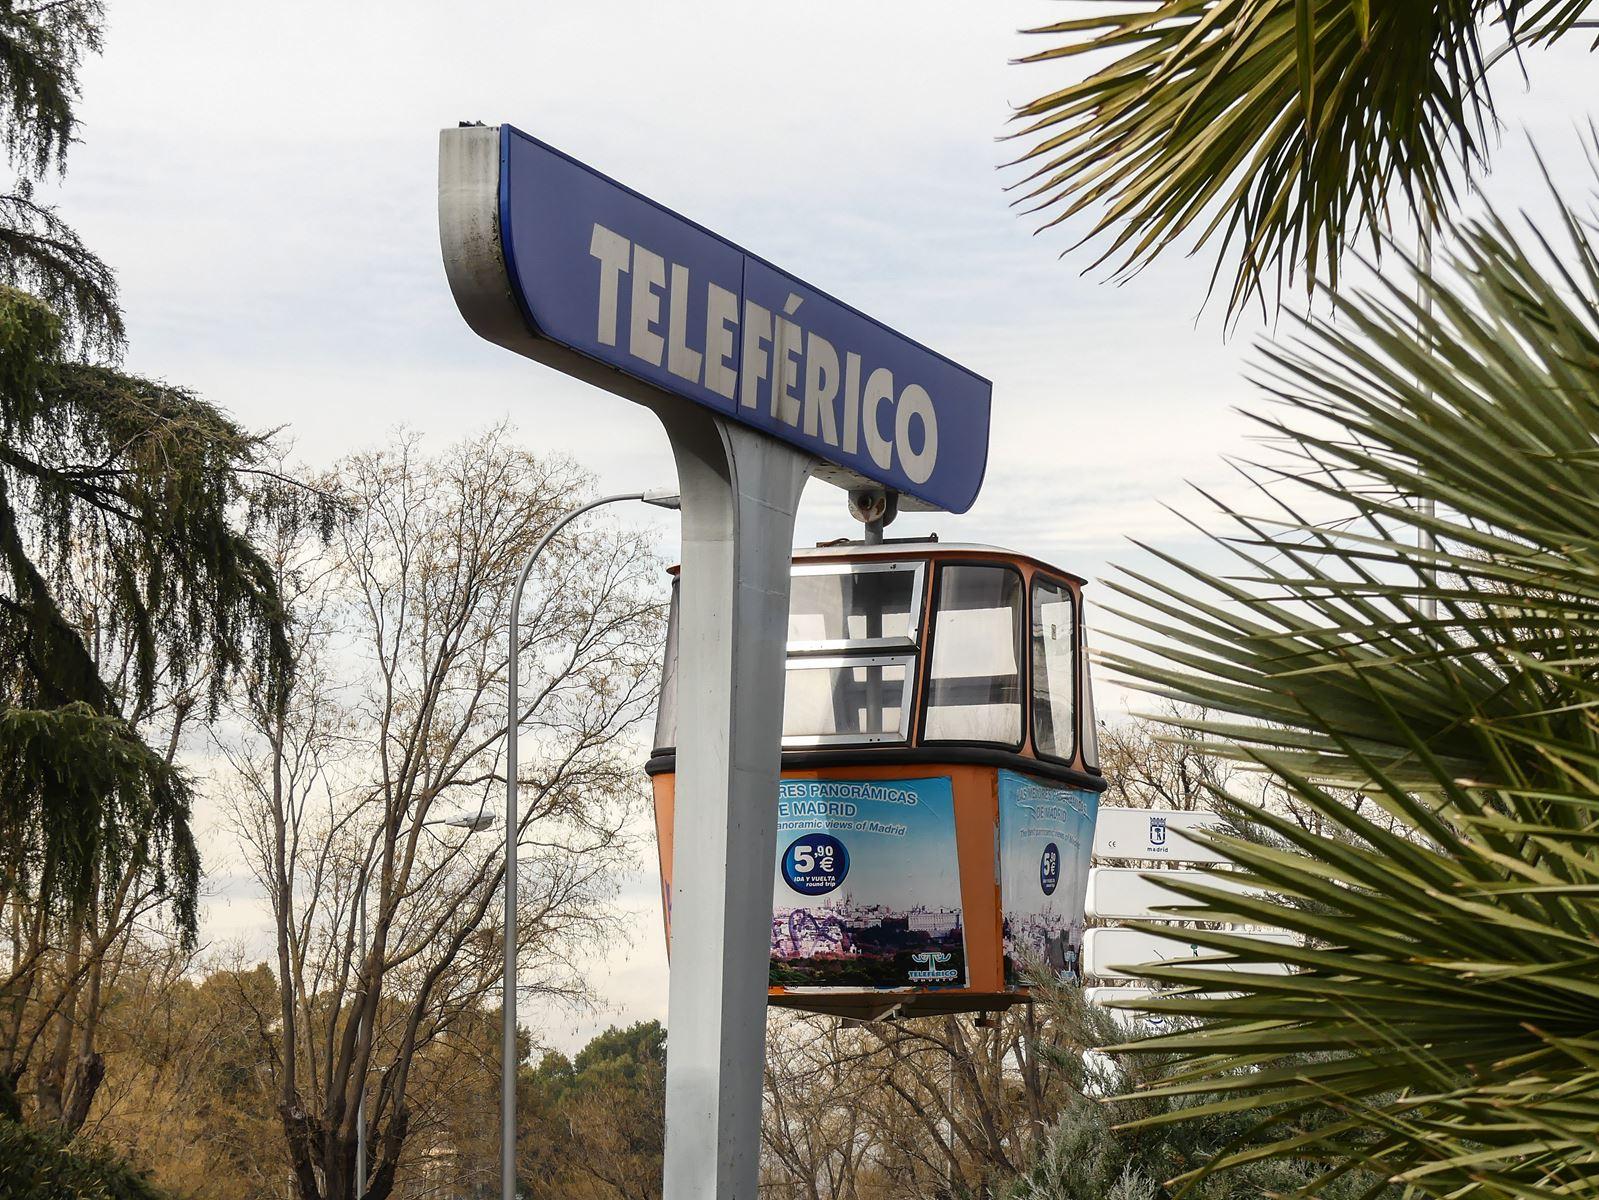 madrid-claironyva-parque de la montane - teleferico